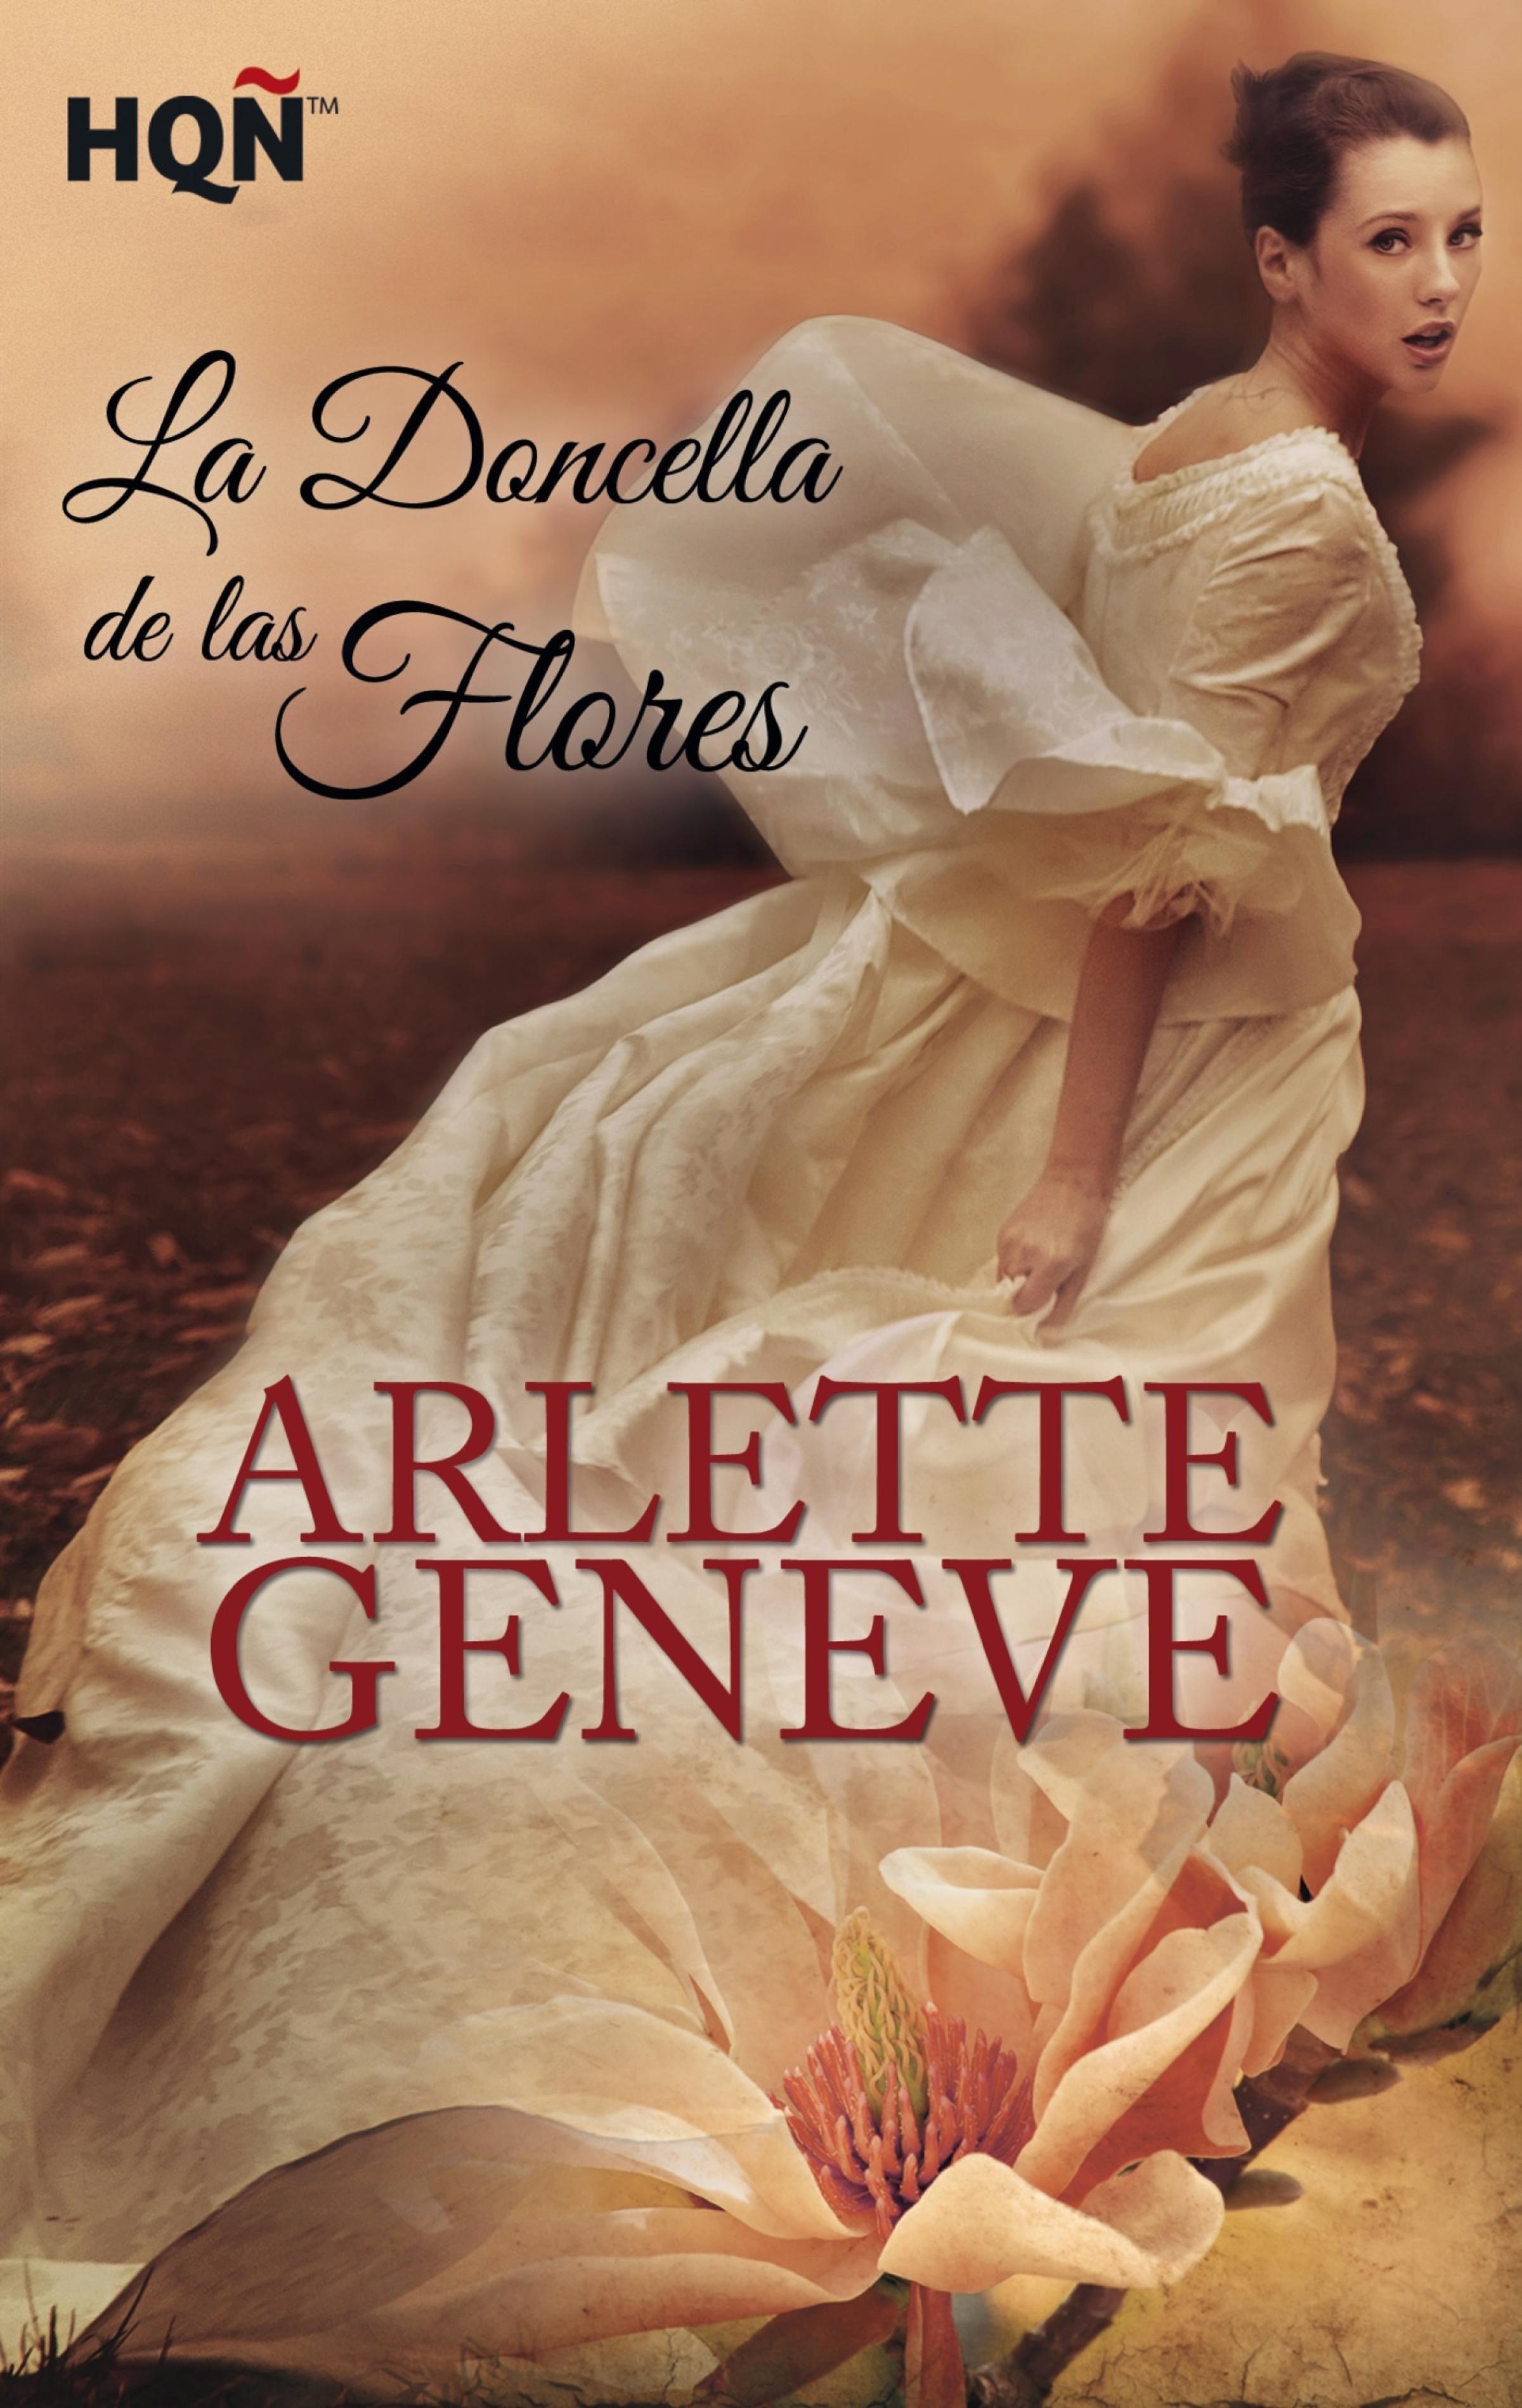 La doncella de las flores, Arlette Geneve (rom) 9788468749181